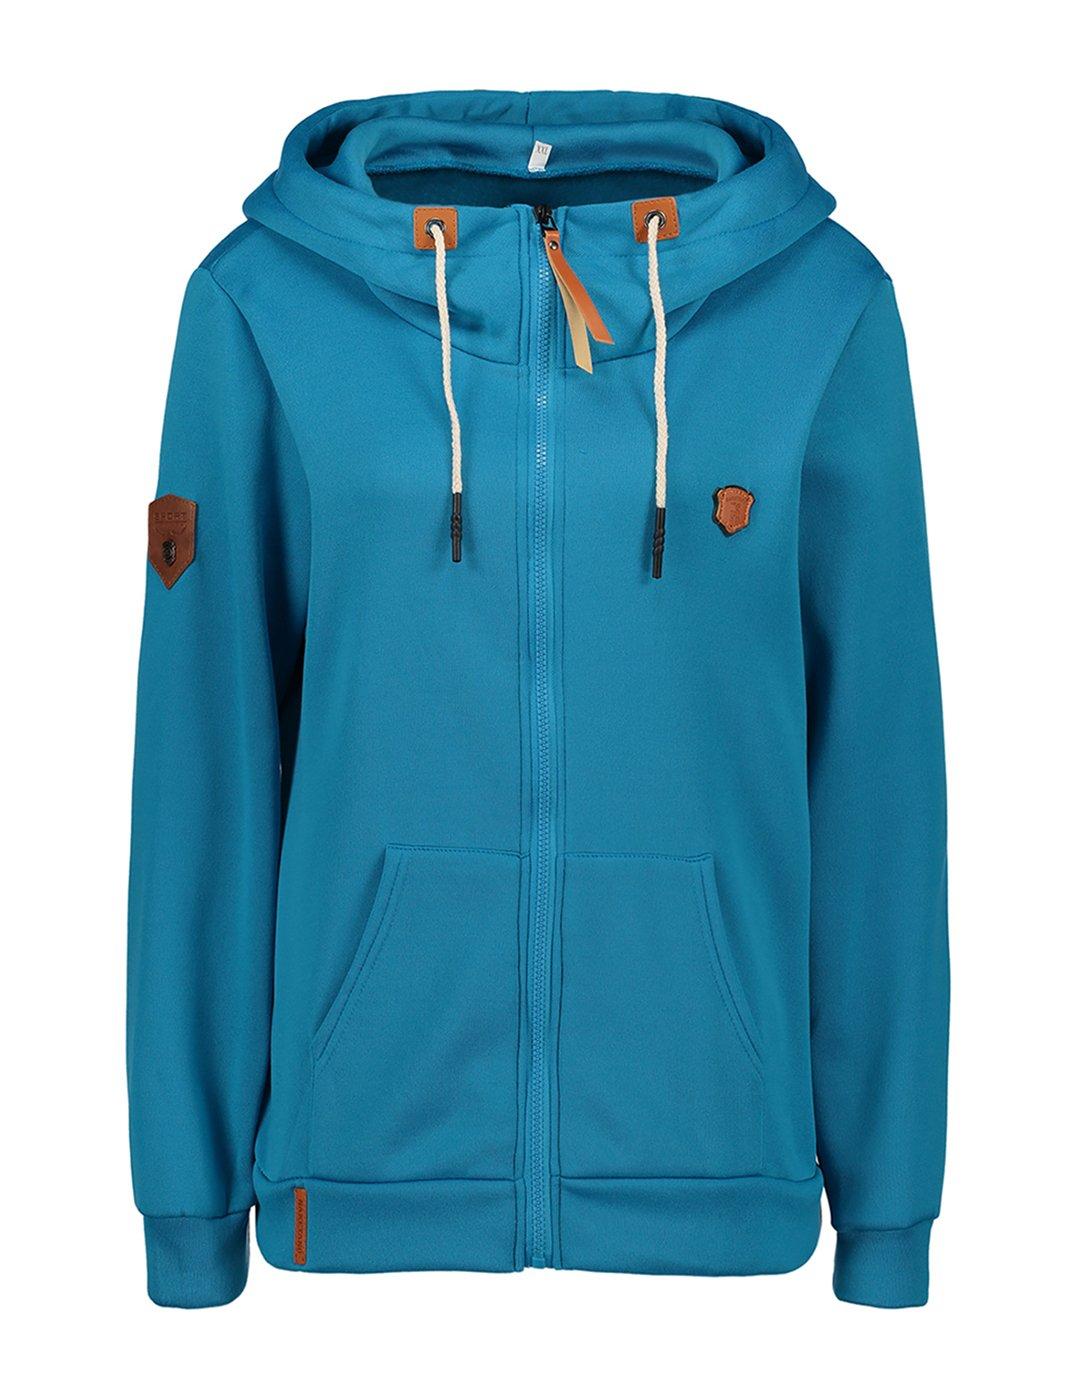 Ecupper Womens Full Zip Funnel Neck EcoSmart Fleece Sweatshirt Hoodies Lake Blue 2XL